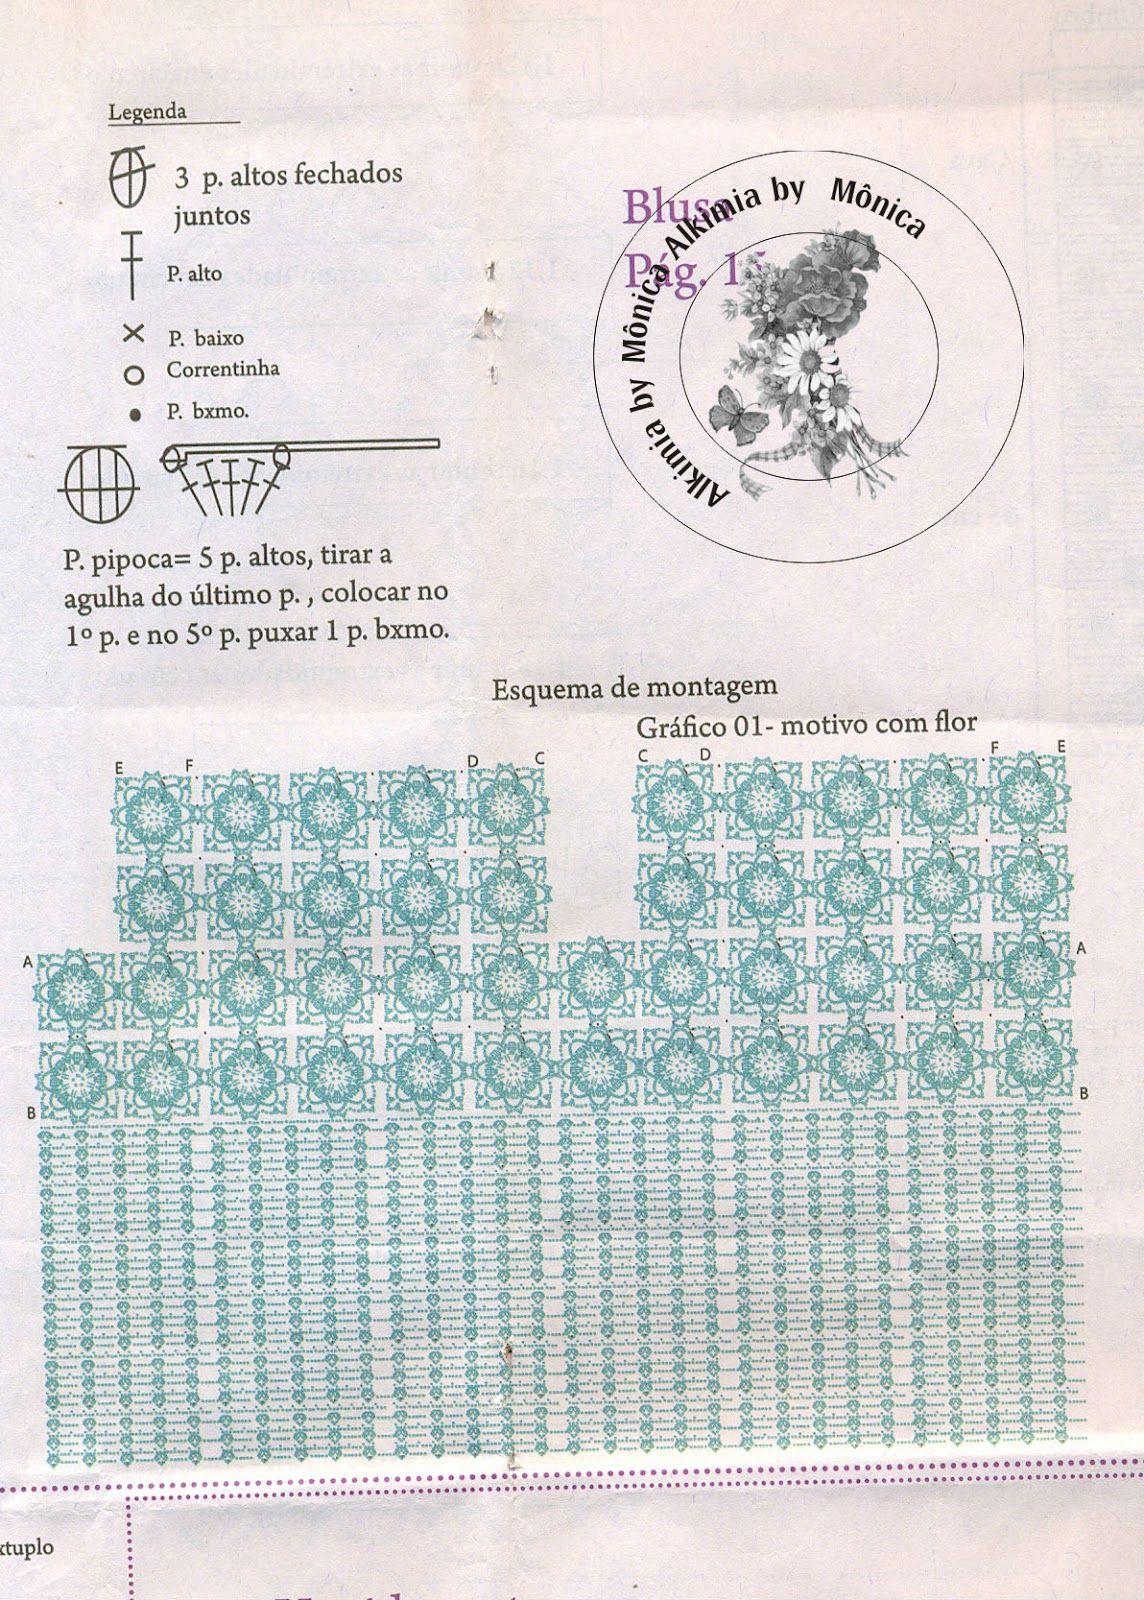 Alkimia: blusa de croche com gráfico